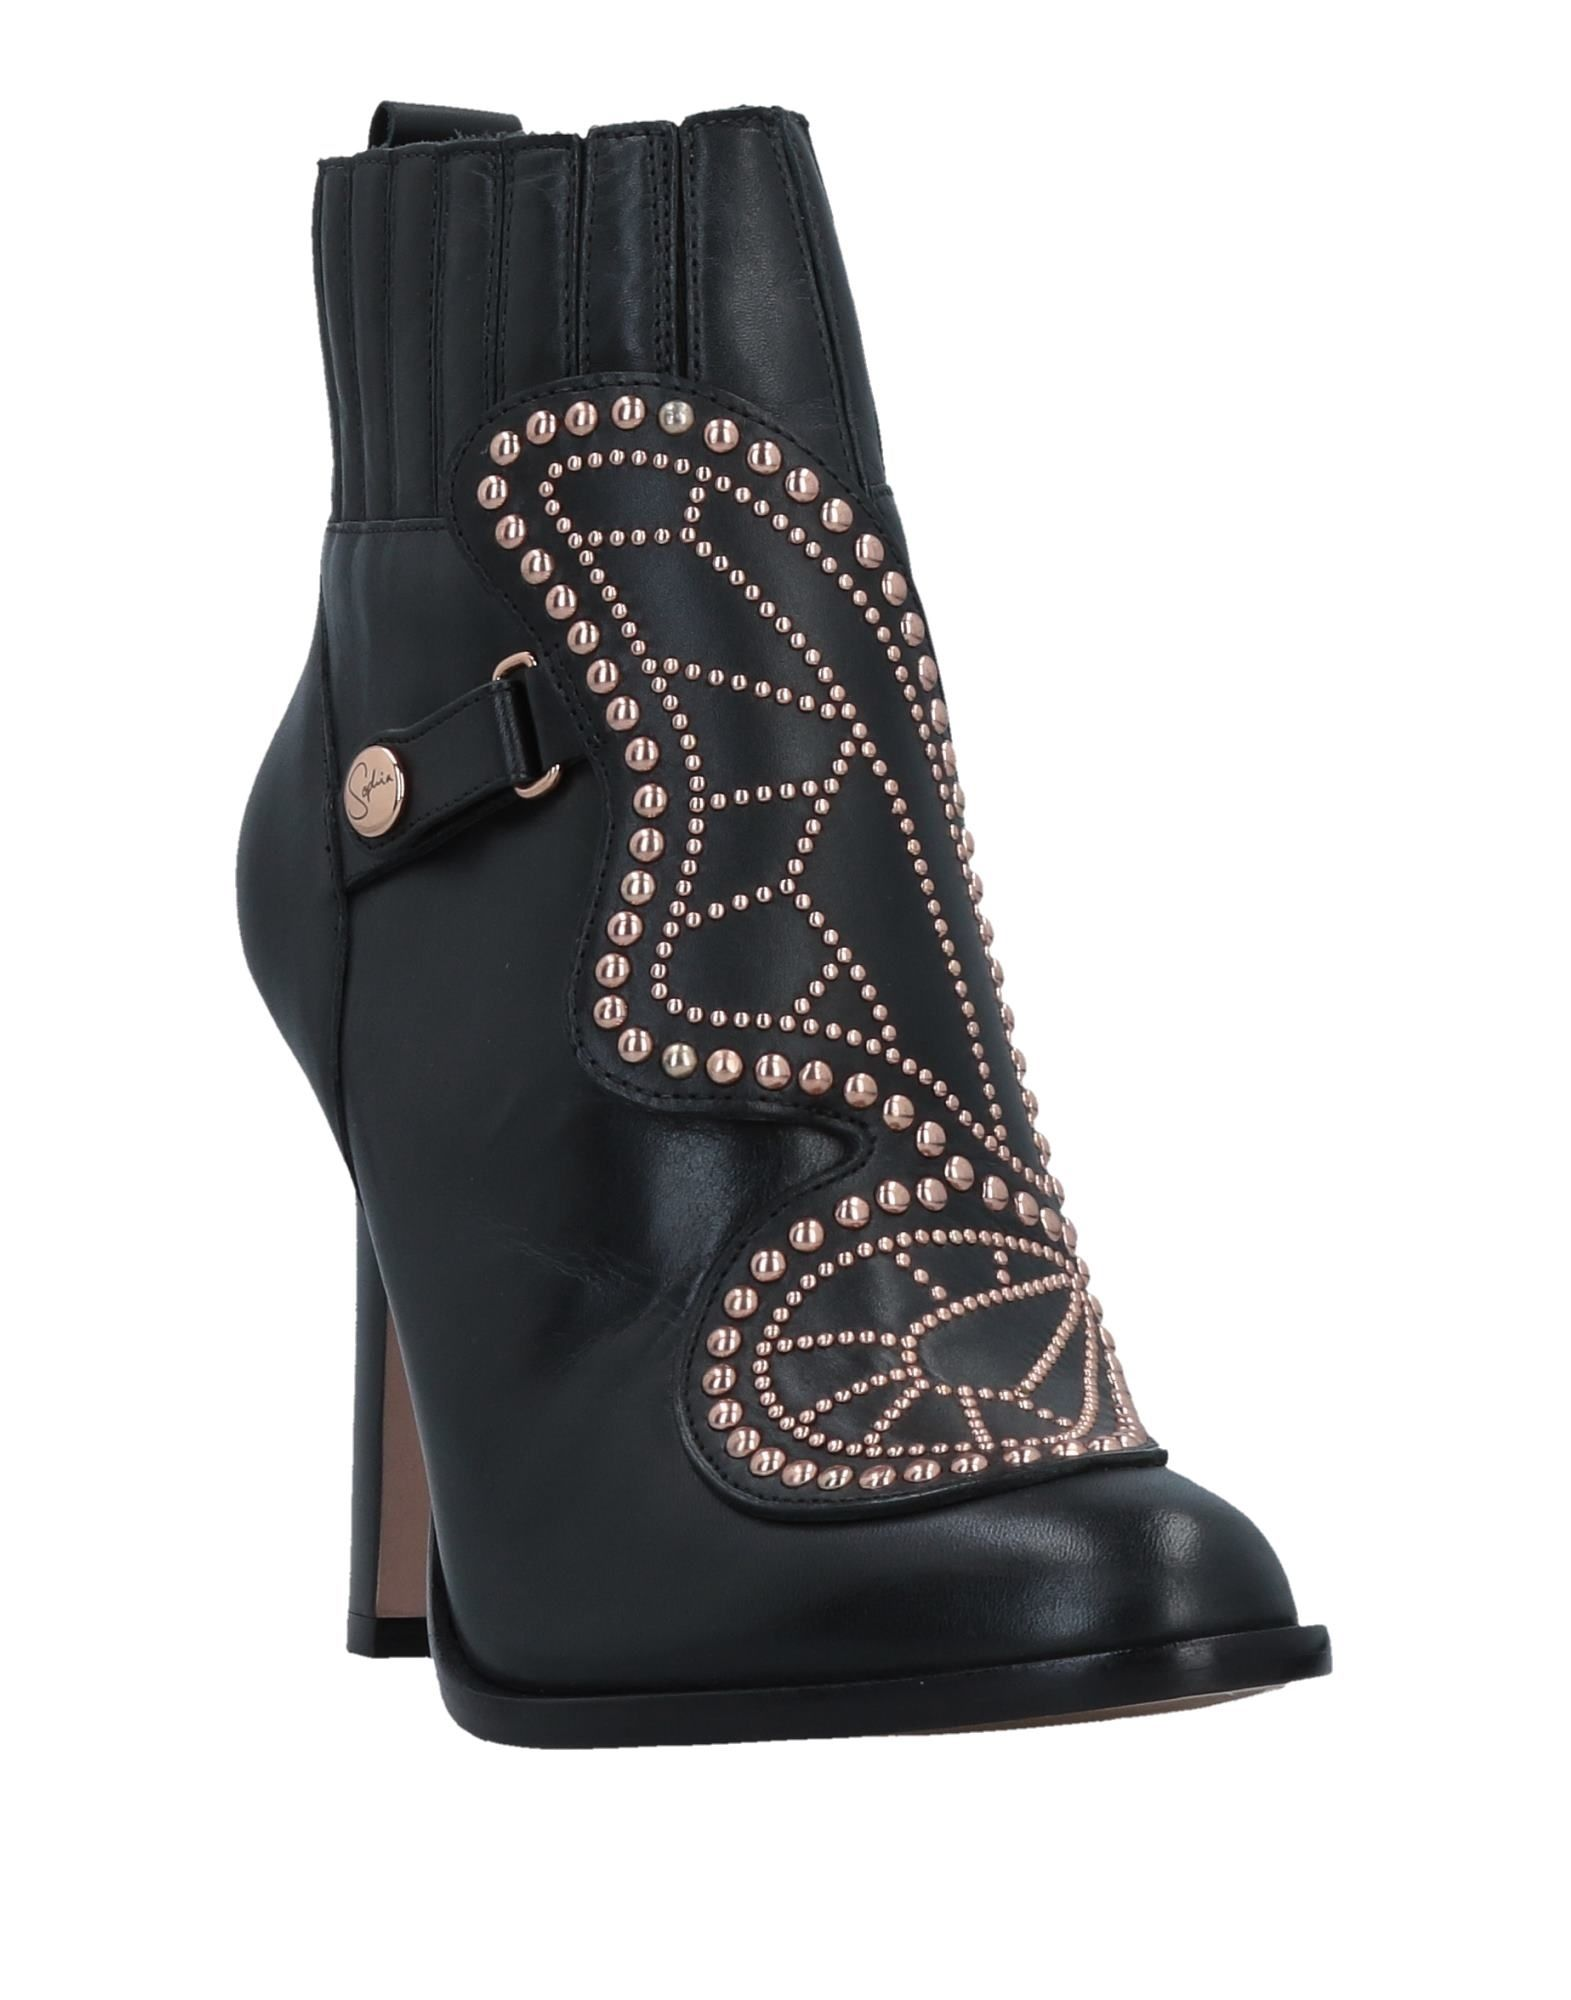 Sophia Webster Stiefelette Damen Schuhe  11508398THGünstige gut aussehende Schuhe Damen a749d6